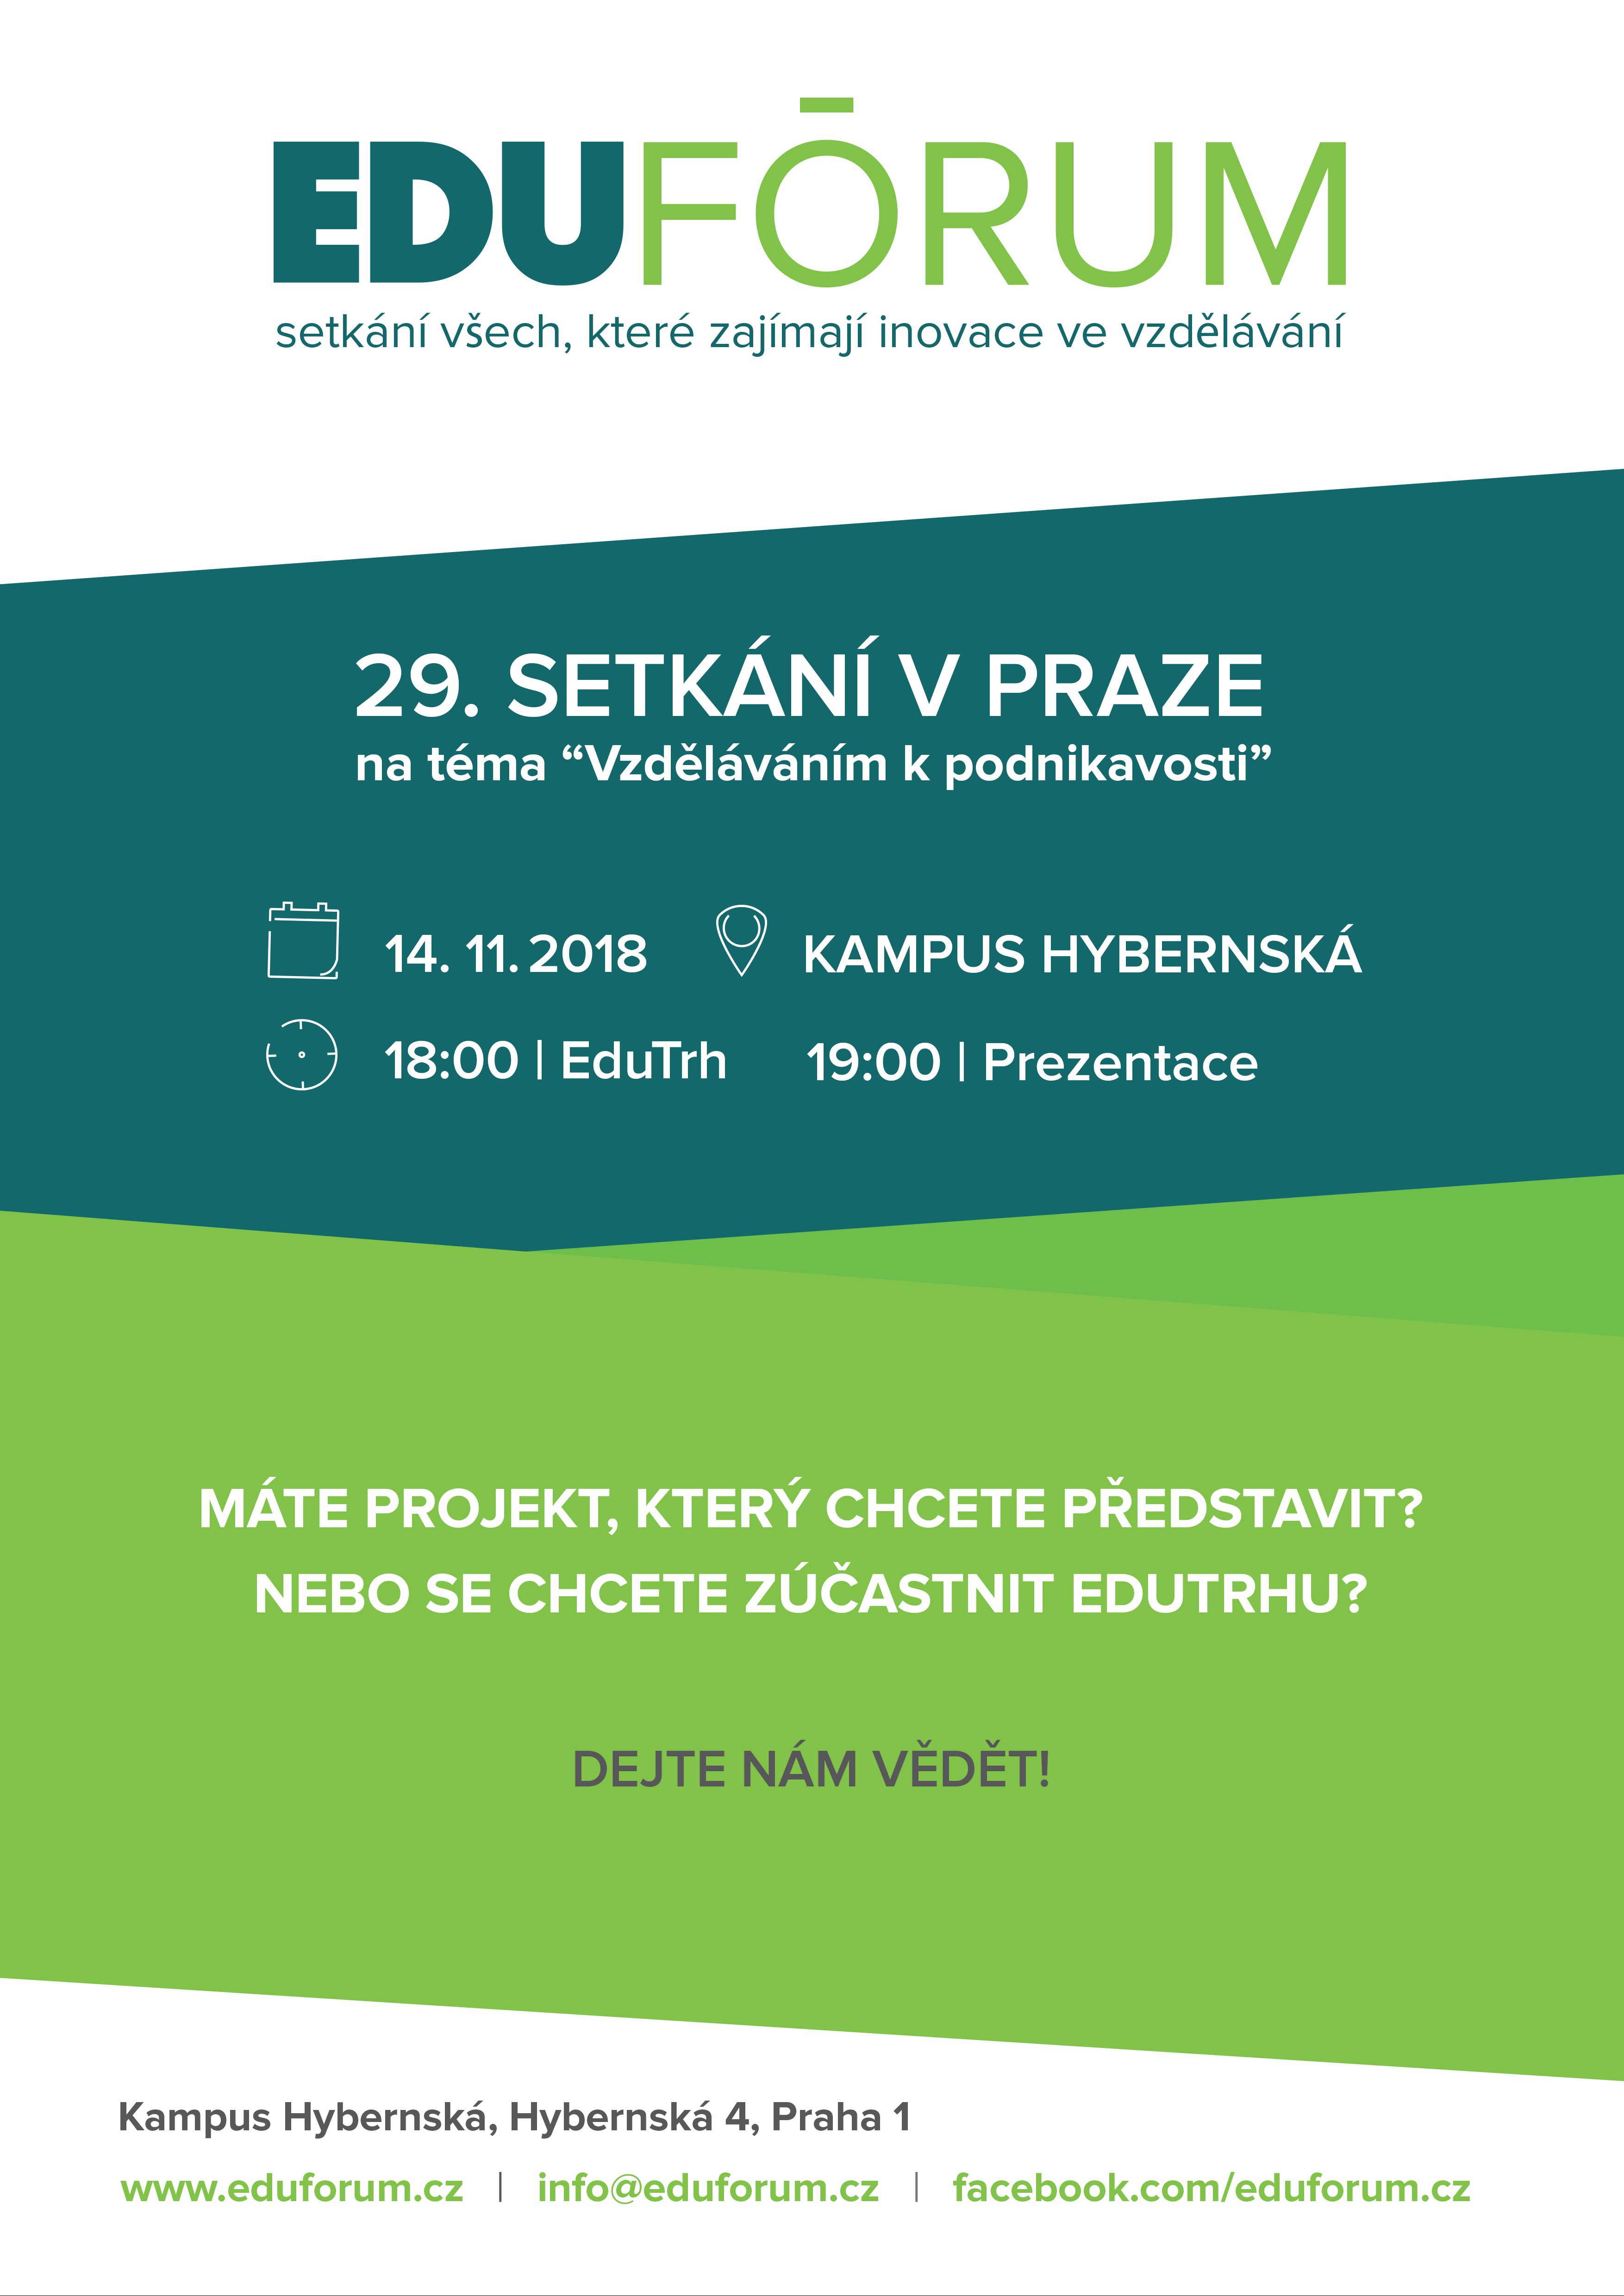 28_meetup_EduForum